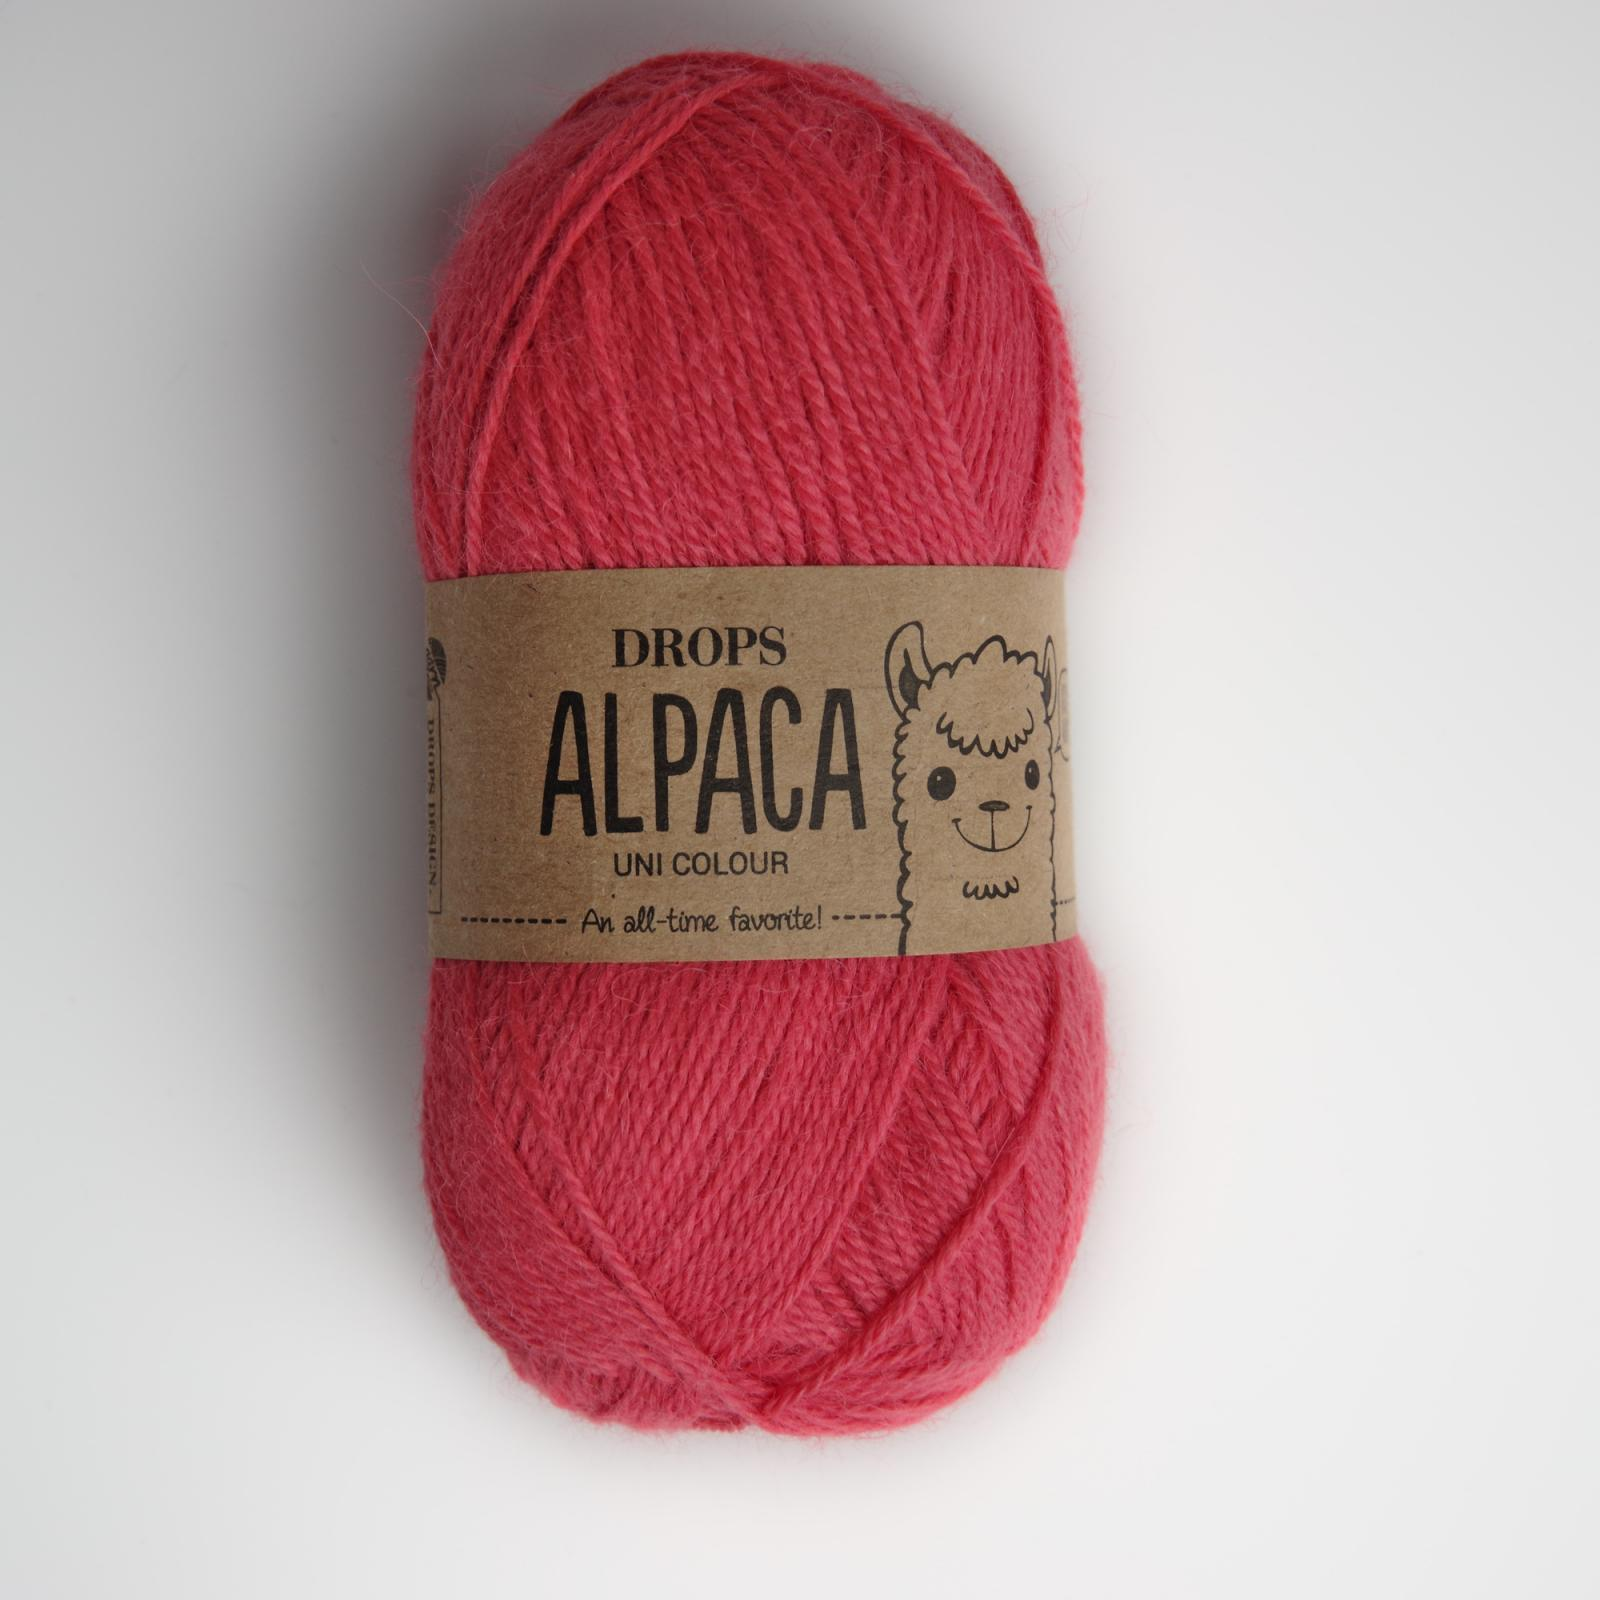 Alpaca - Uni colour - 9022 koral